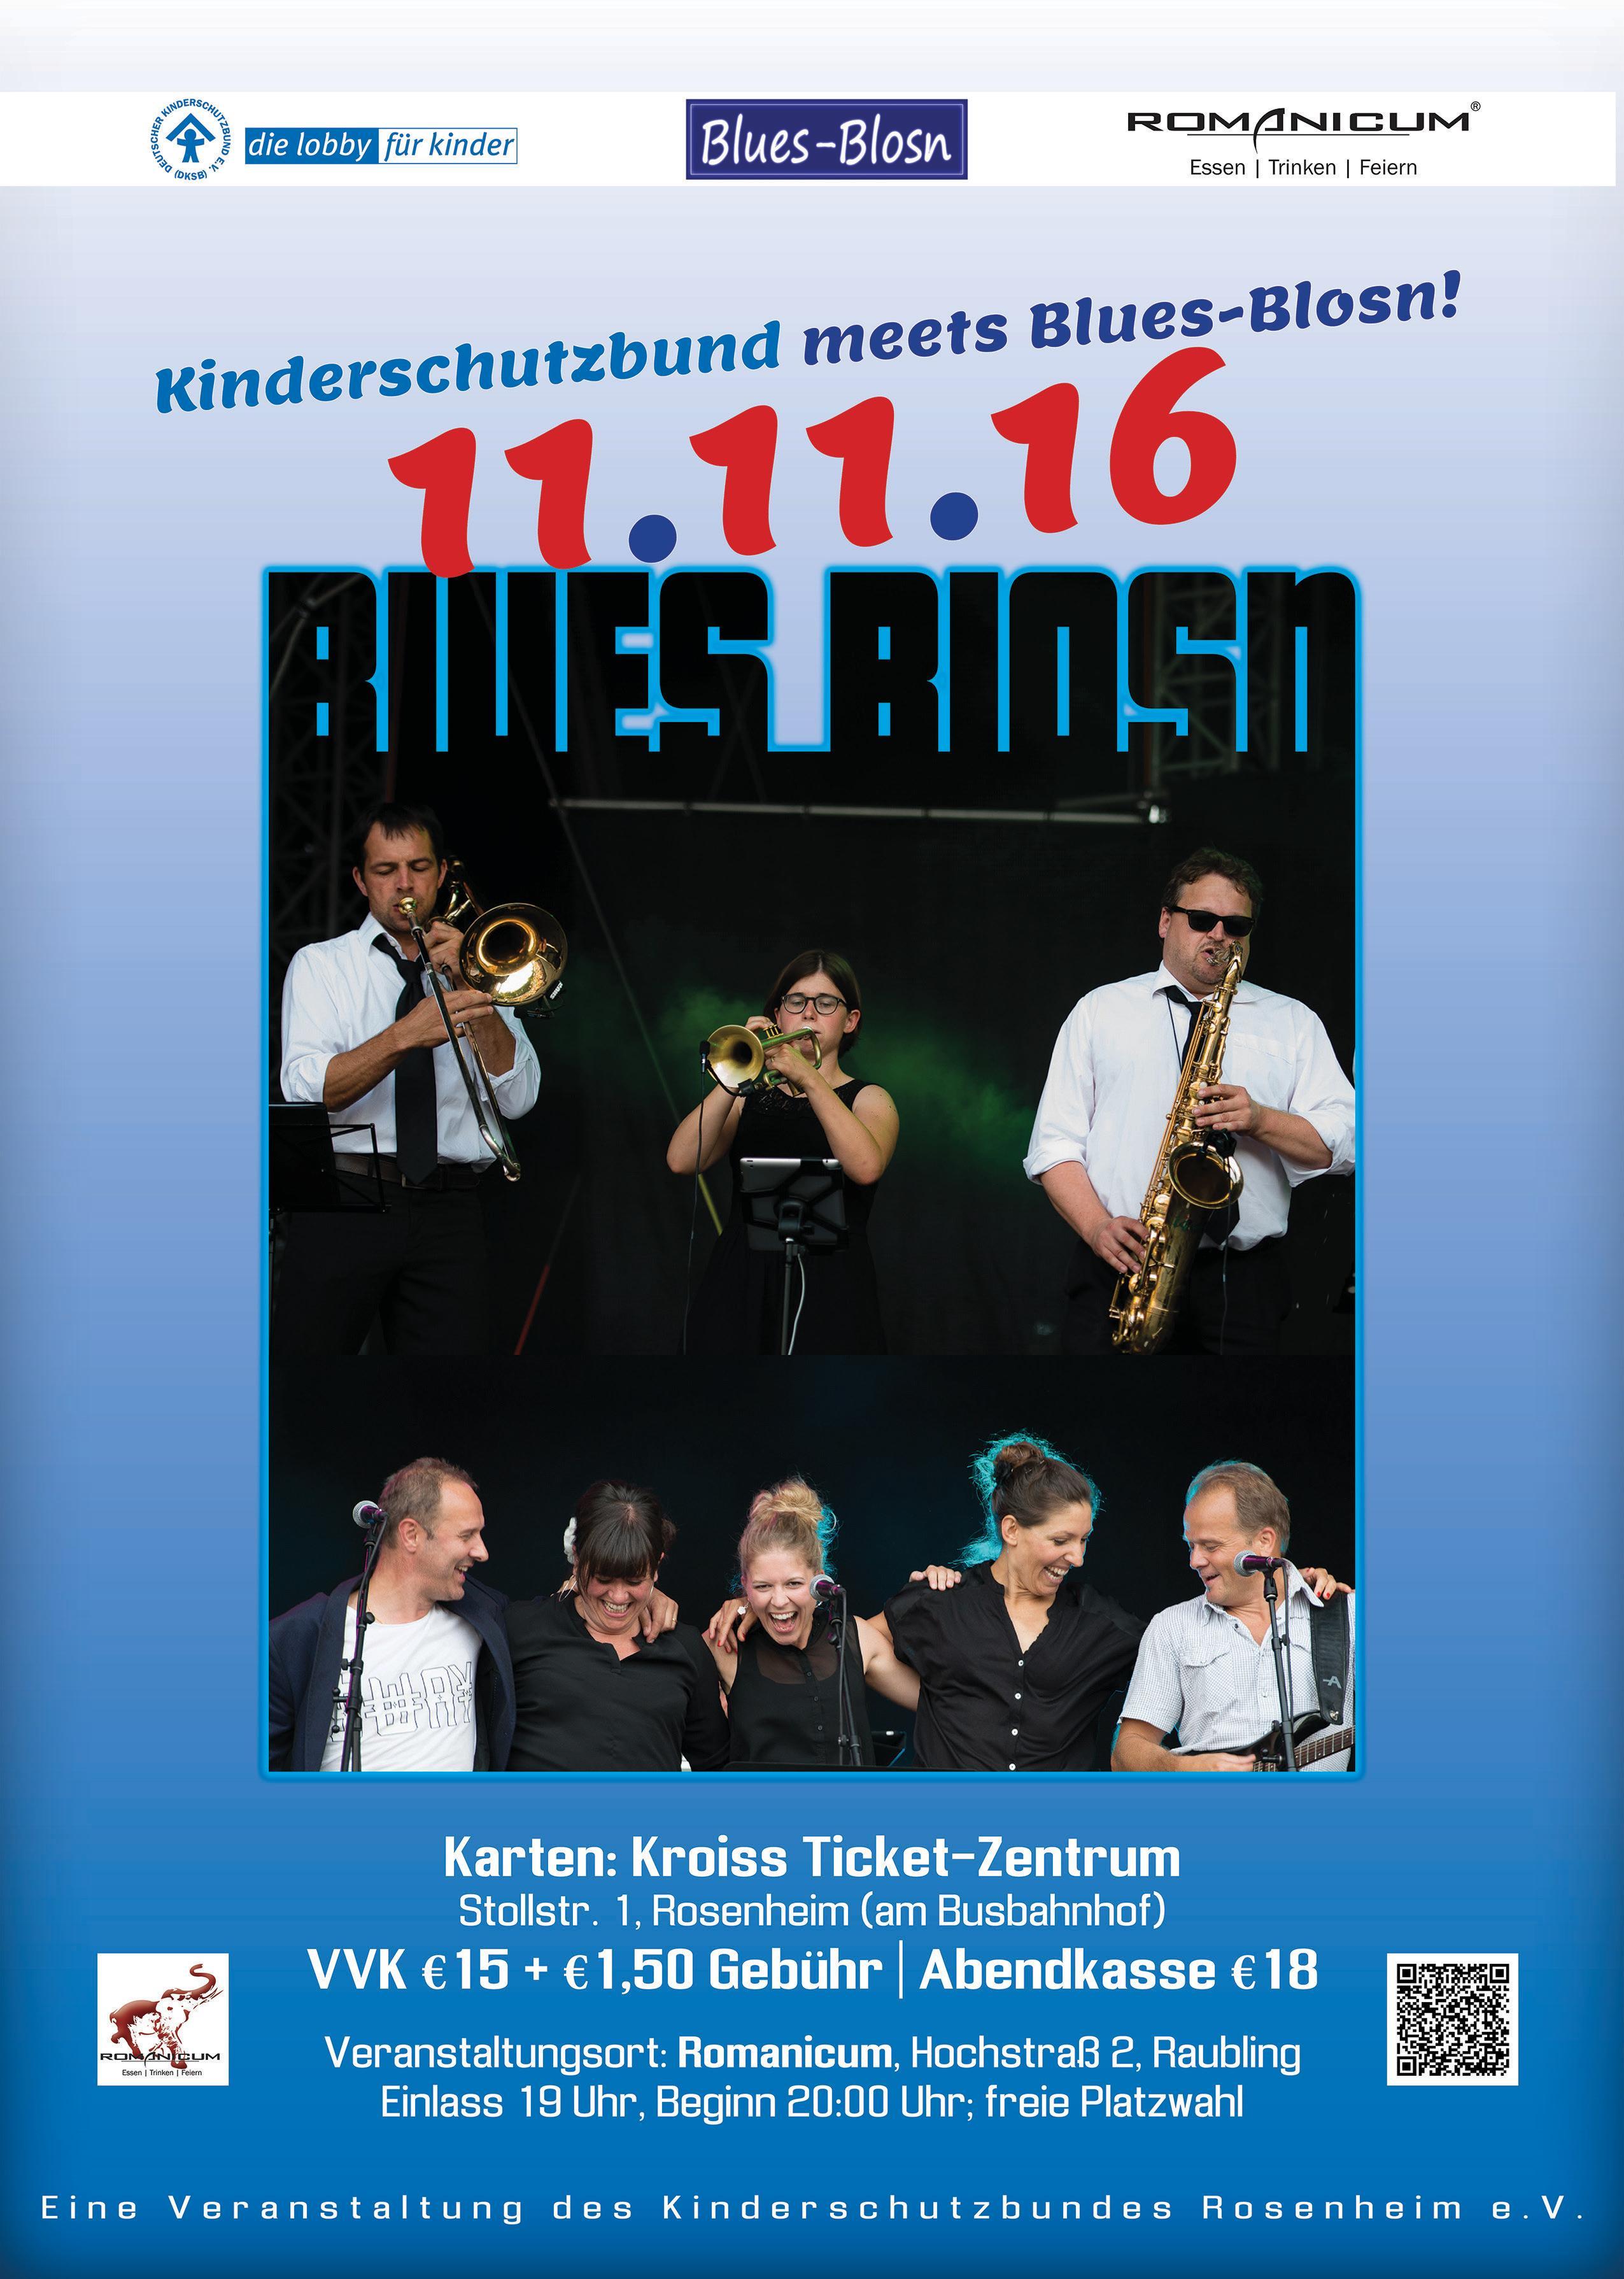 Blues-Blosn Plakat A4-page-001